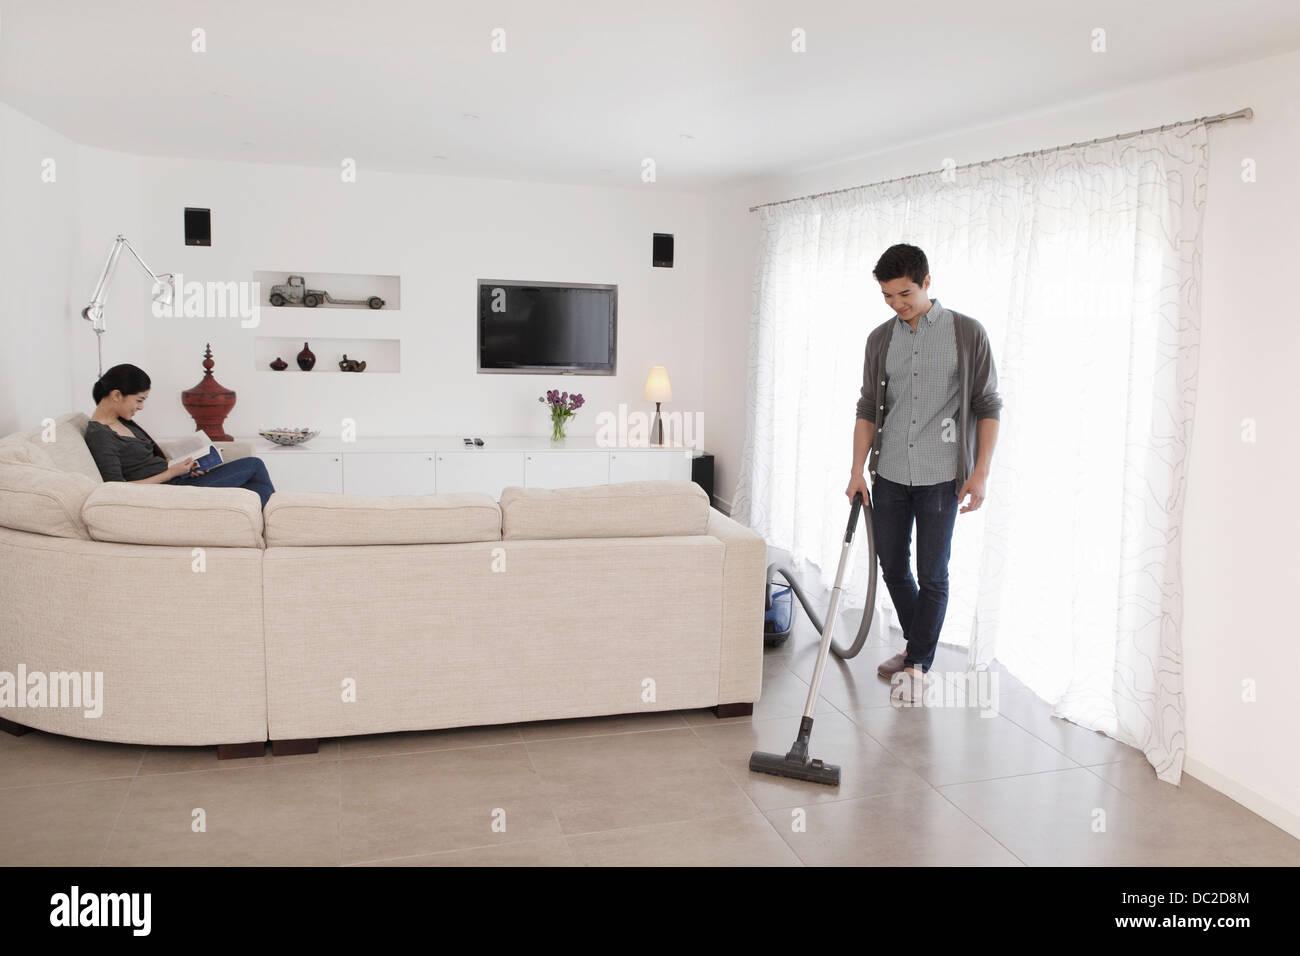 Man vacuuming living room floor - Stock Image